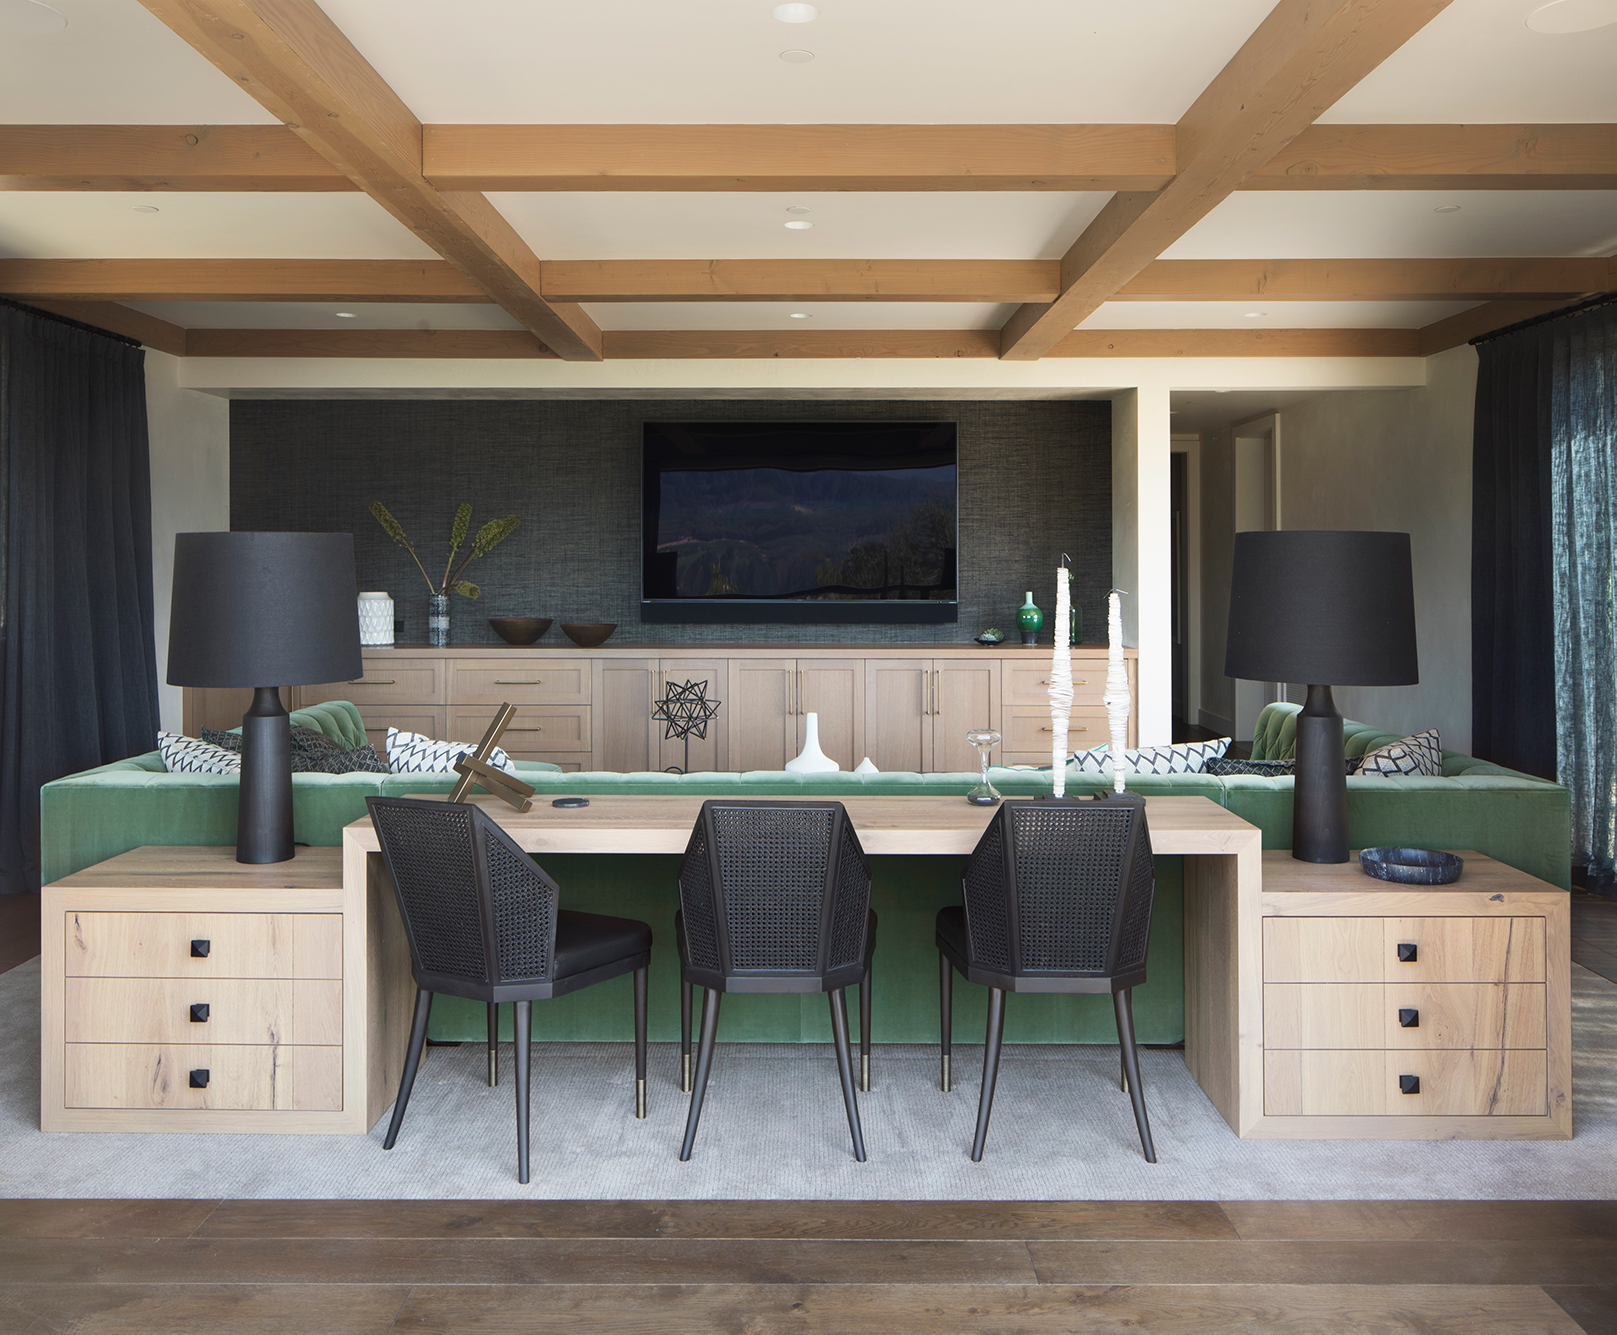 Jennifer_robins_interiors_projects_st_helena_IIII_Conn_16_HR_living_room_LR_television